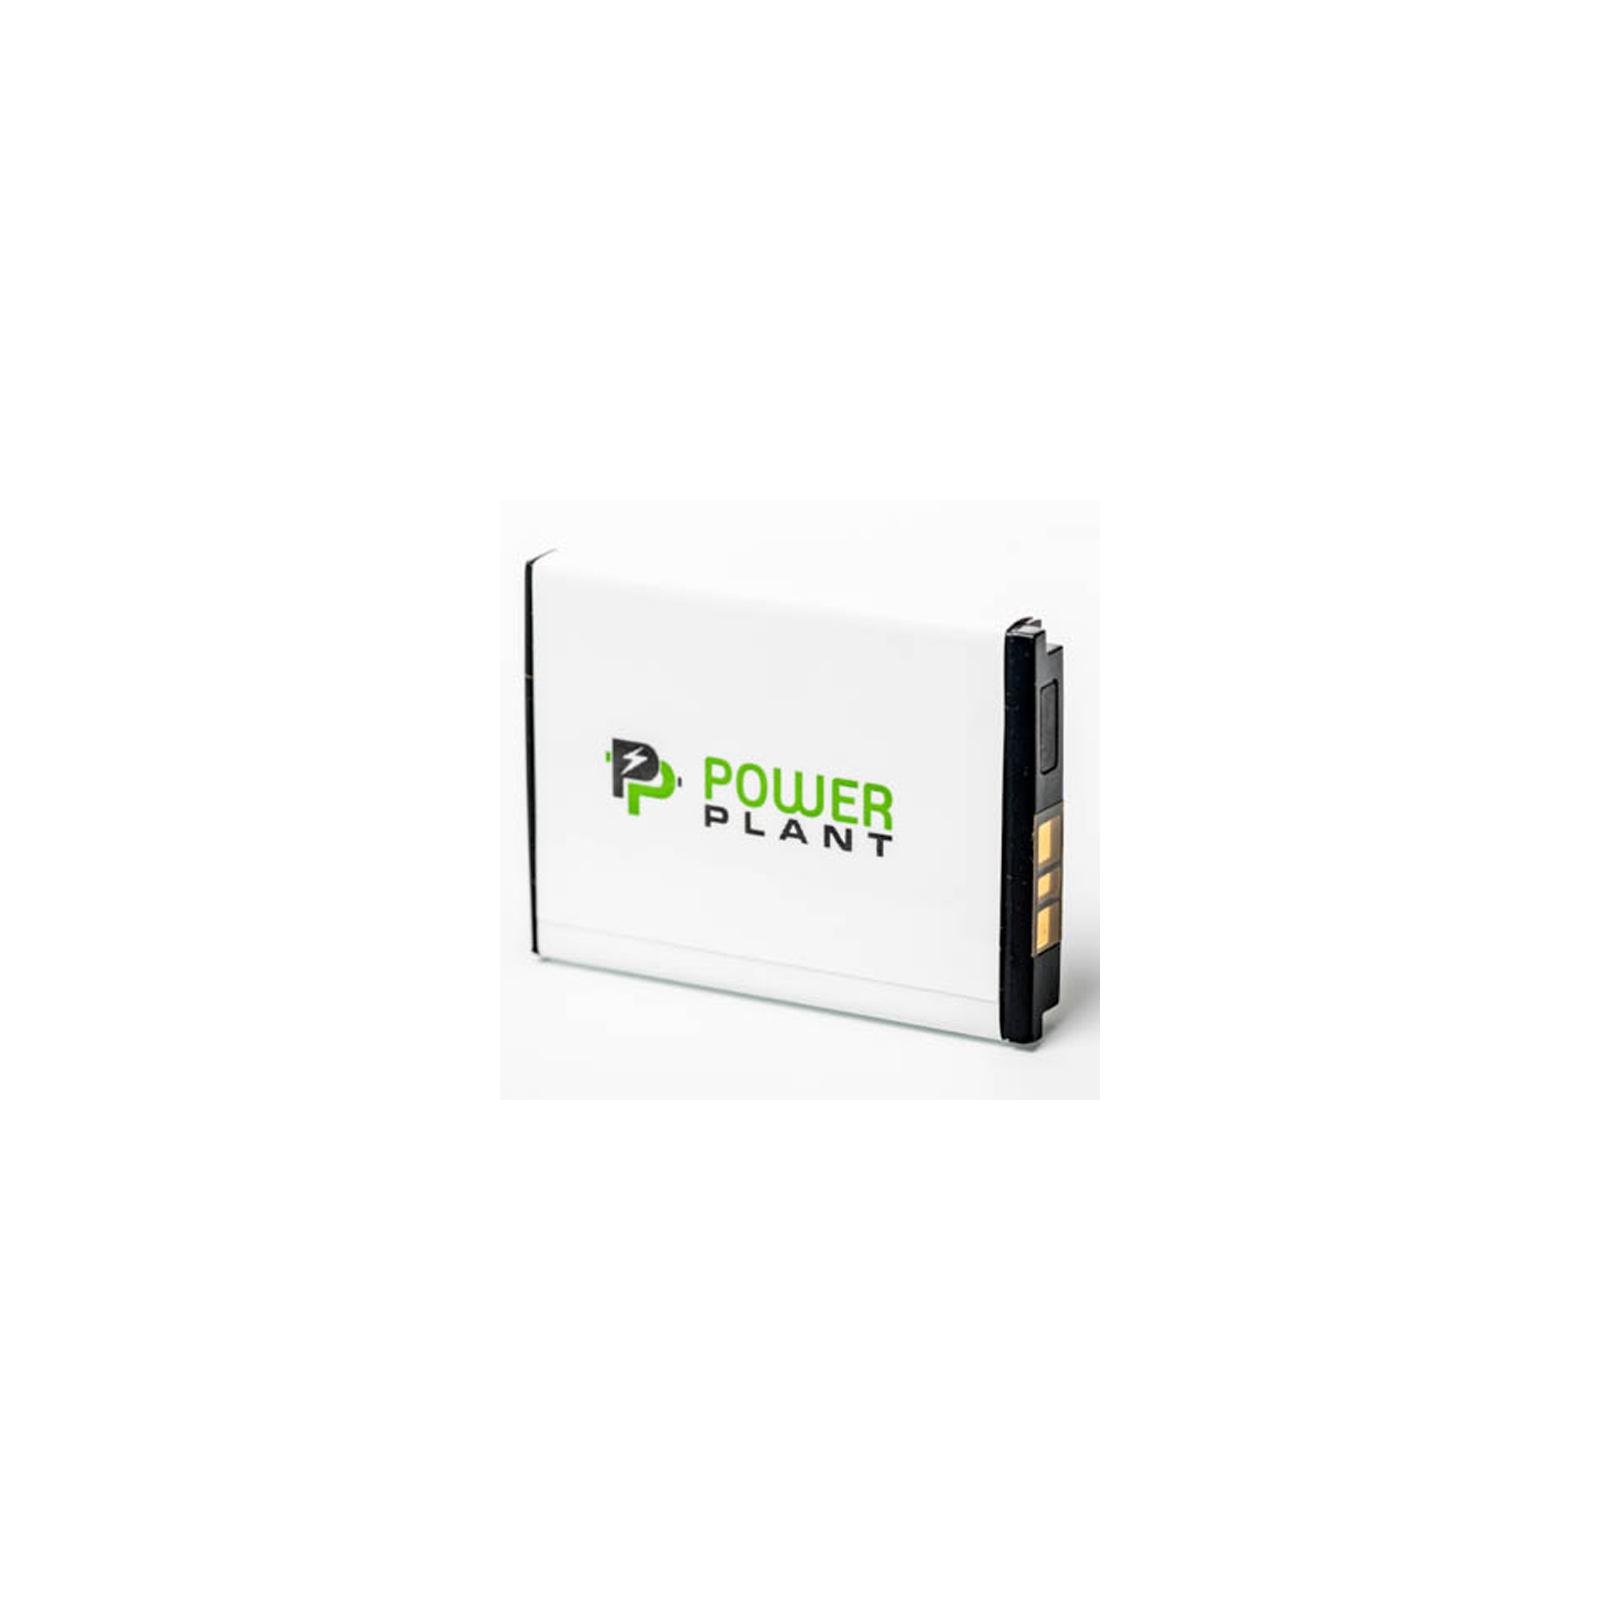 Аккумуляторная батарея PowerPlant Sony Ericsson BST-37 (J220, K610, K750, Z520, W800) (DV00DV1142) изображение 2